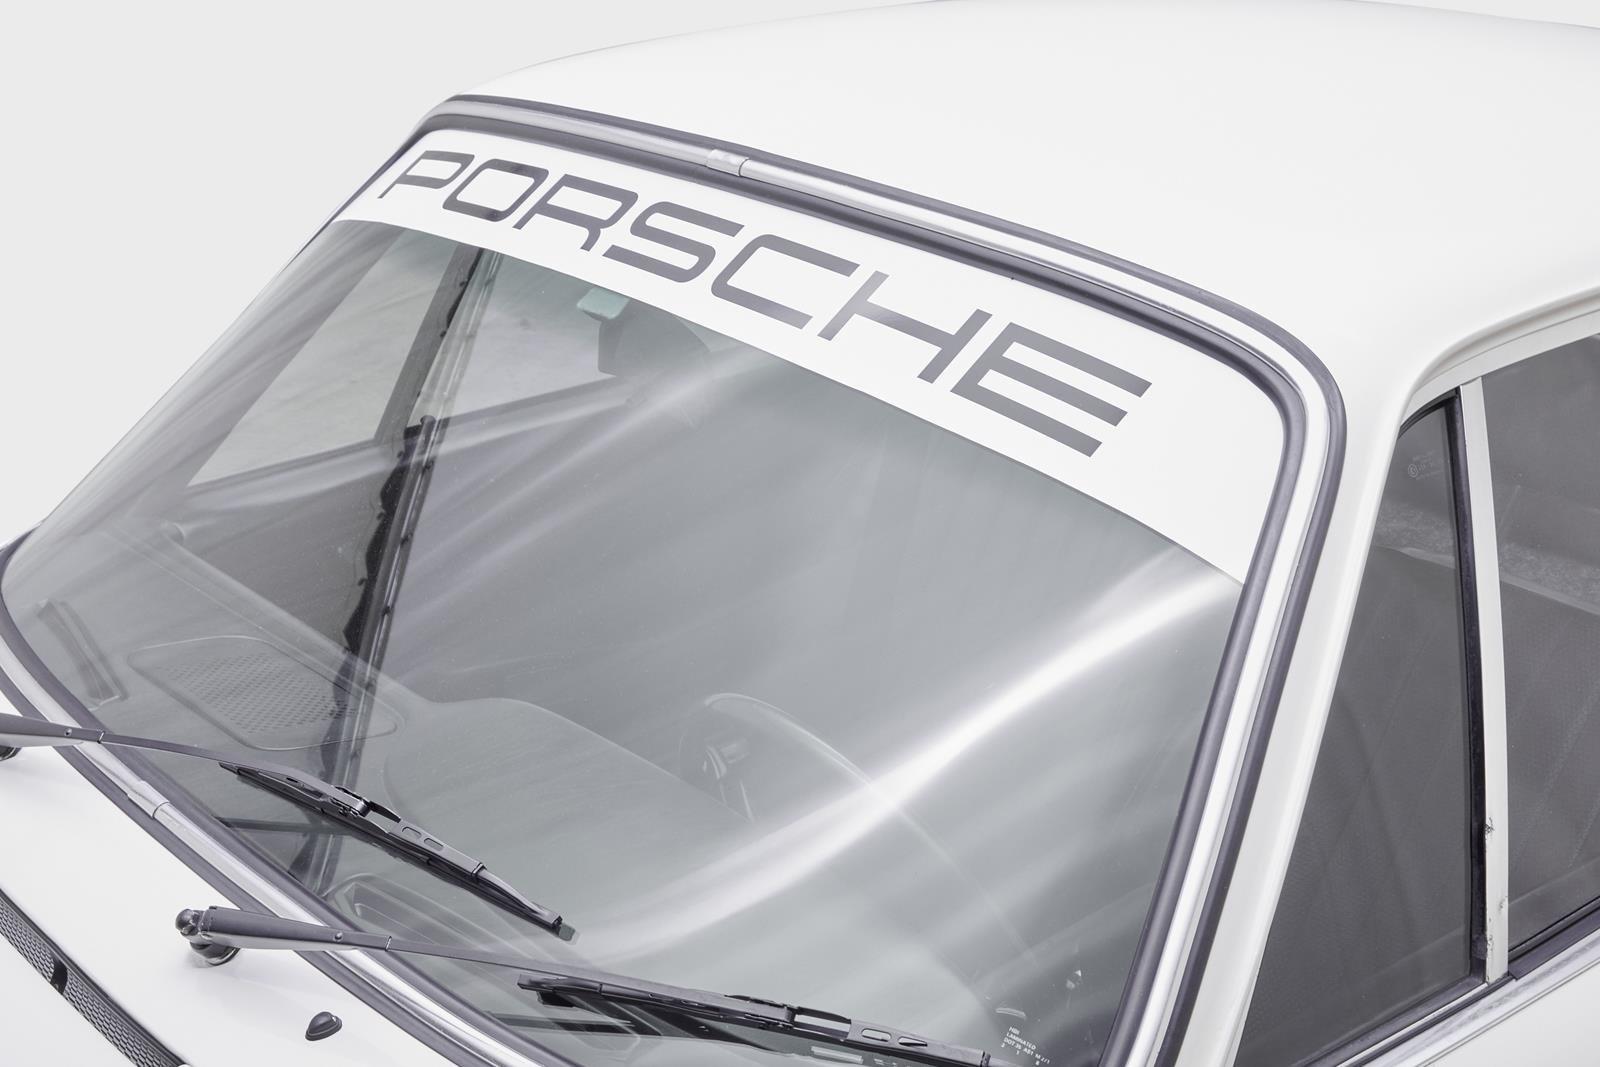 1970 Porsche 911T 2,2 For Sale (picture 2 of 6)